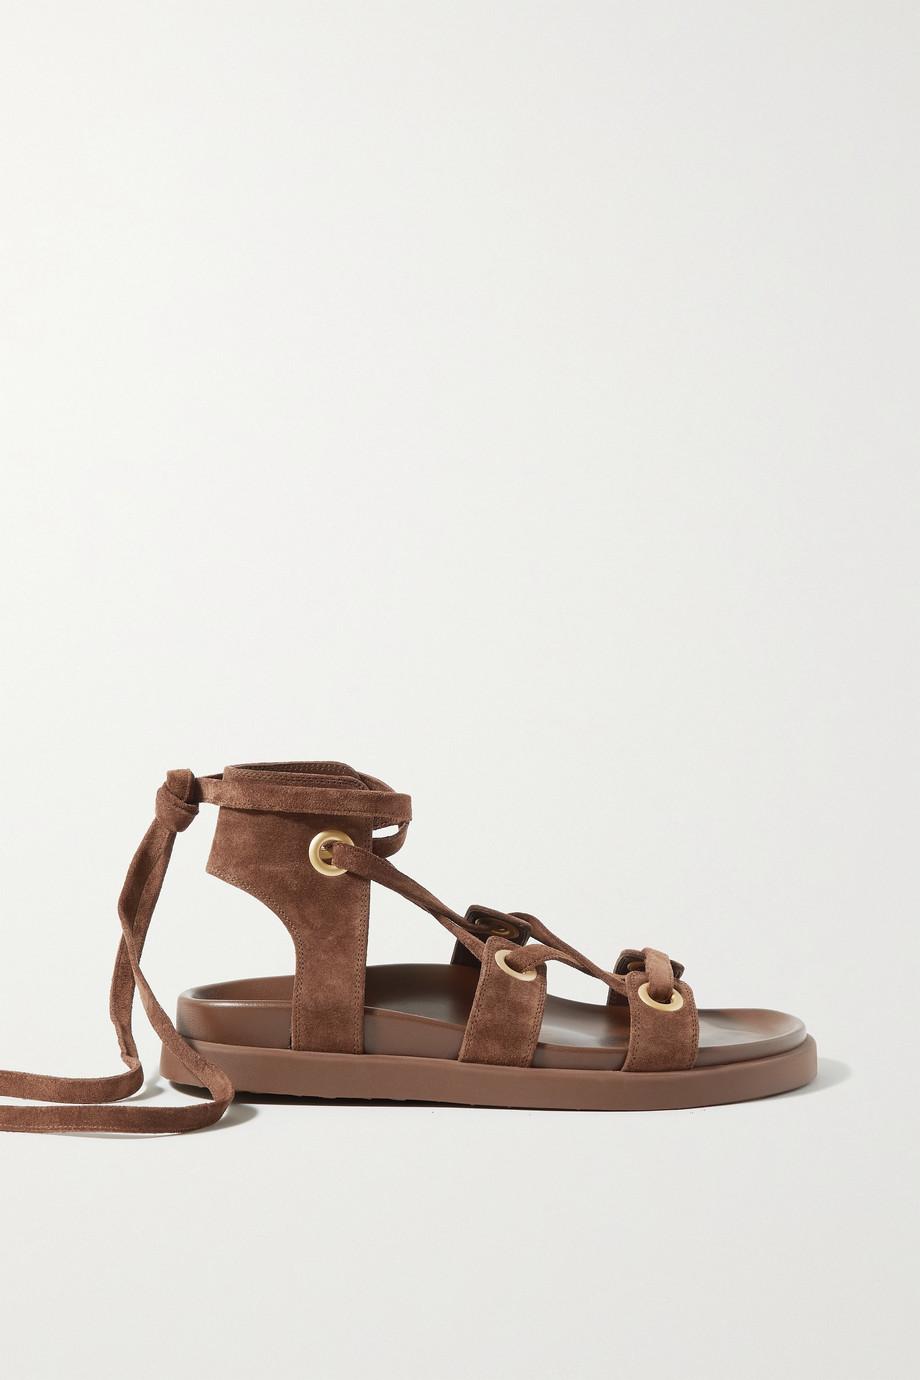 Gianvito Rossi Ibiza suede sandals